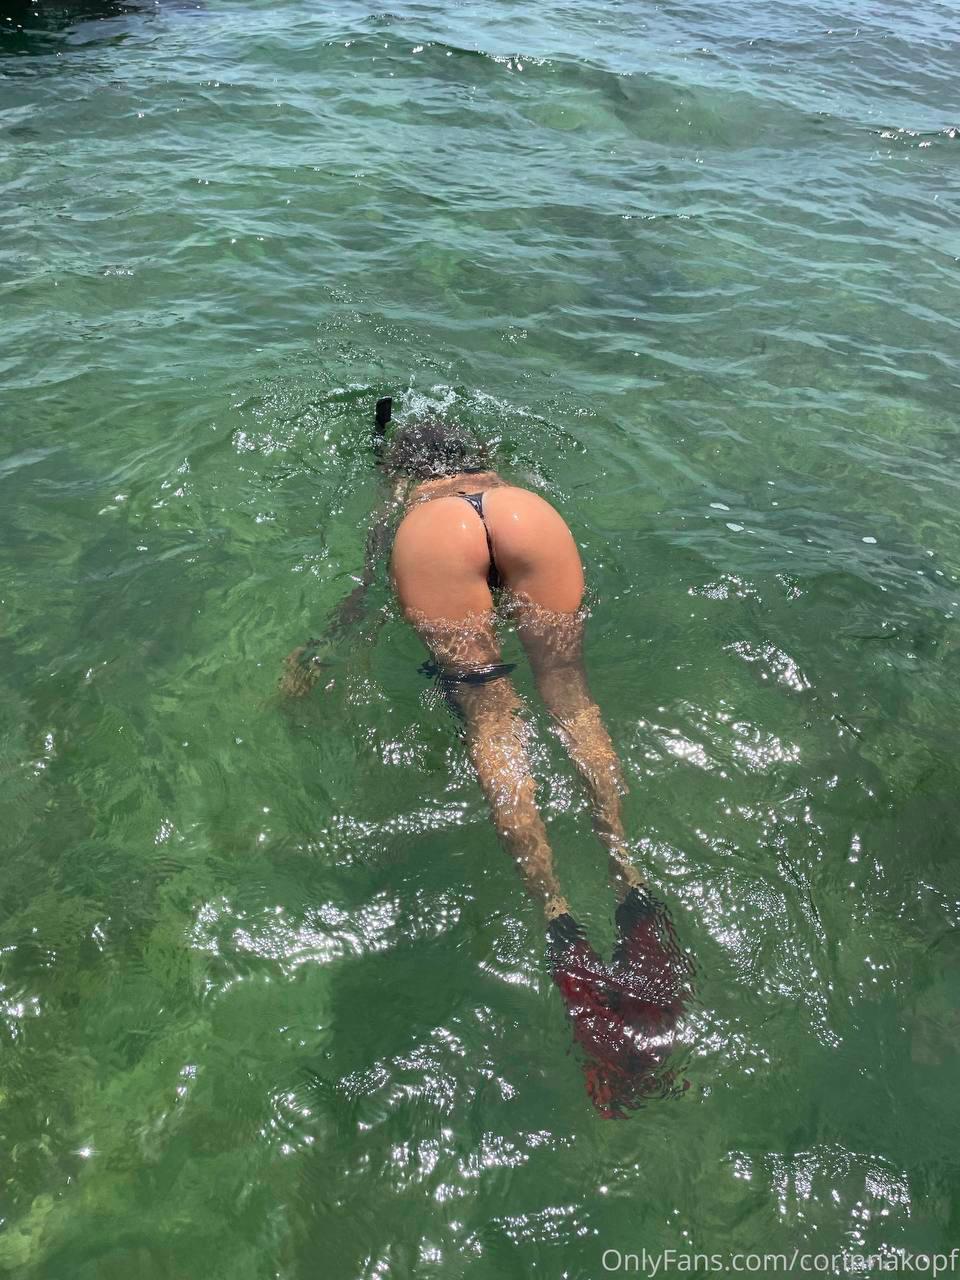 Corinna Kopf Nude Lingerie Onlyfans Set Leaked Srhcoj